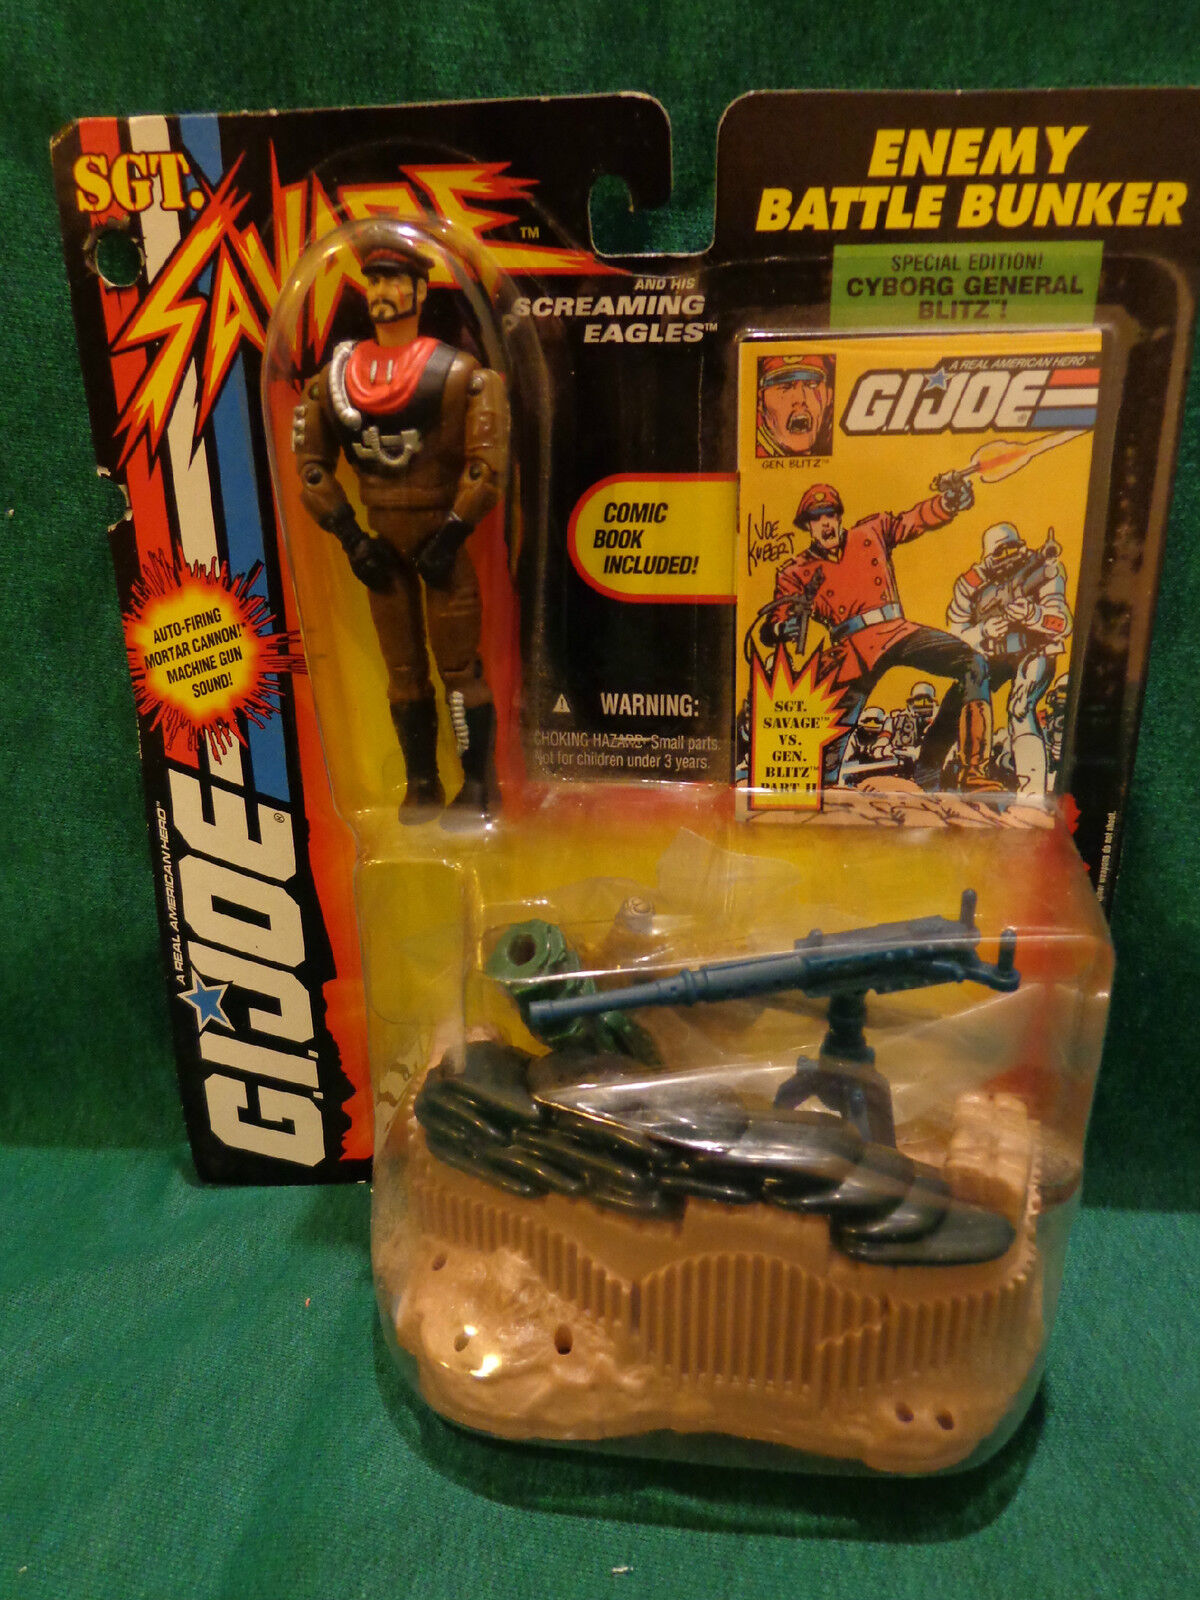 Gi Joe 5  figure Sgt Savage Enemy Battle Bunker and his Screaming Eagles Rare